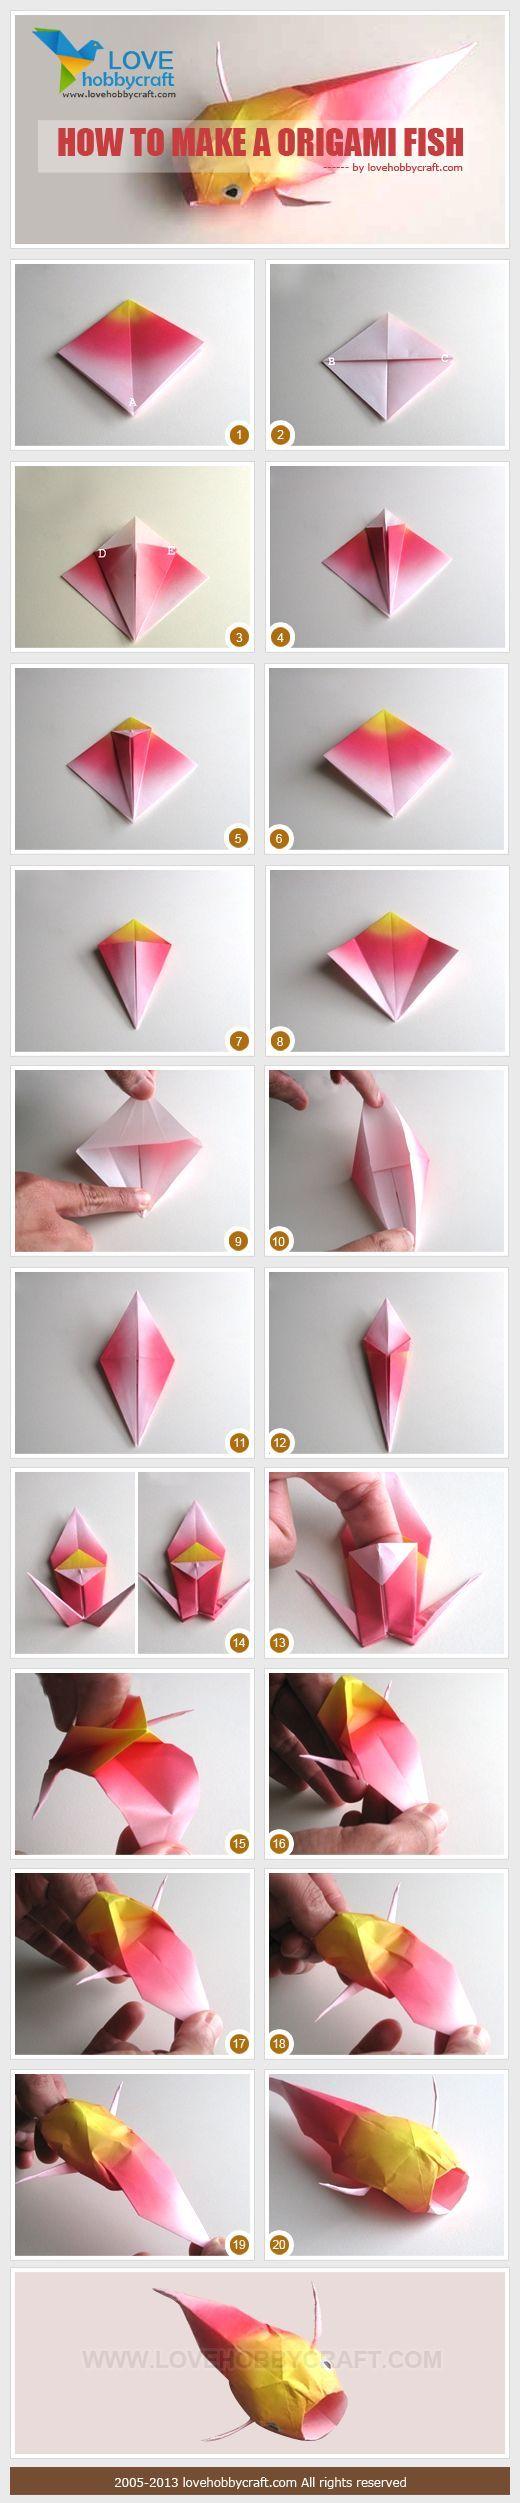 How to make origami fishbag-271                                                                                                                                                                                 More